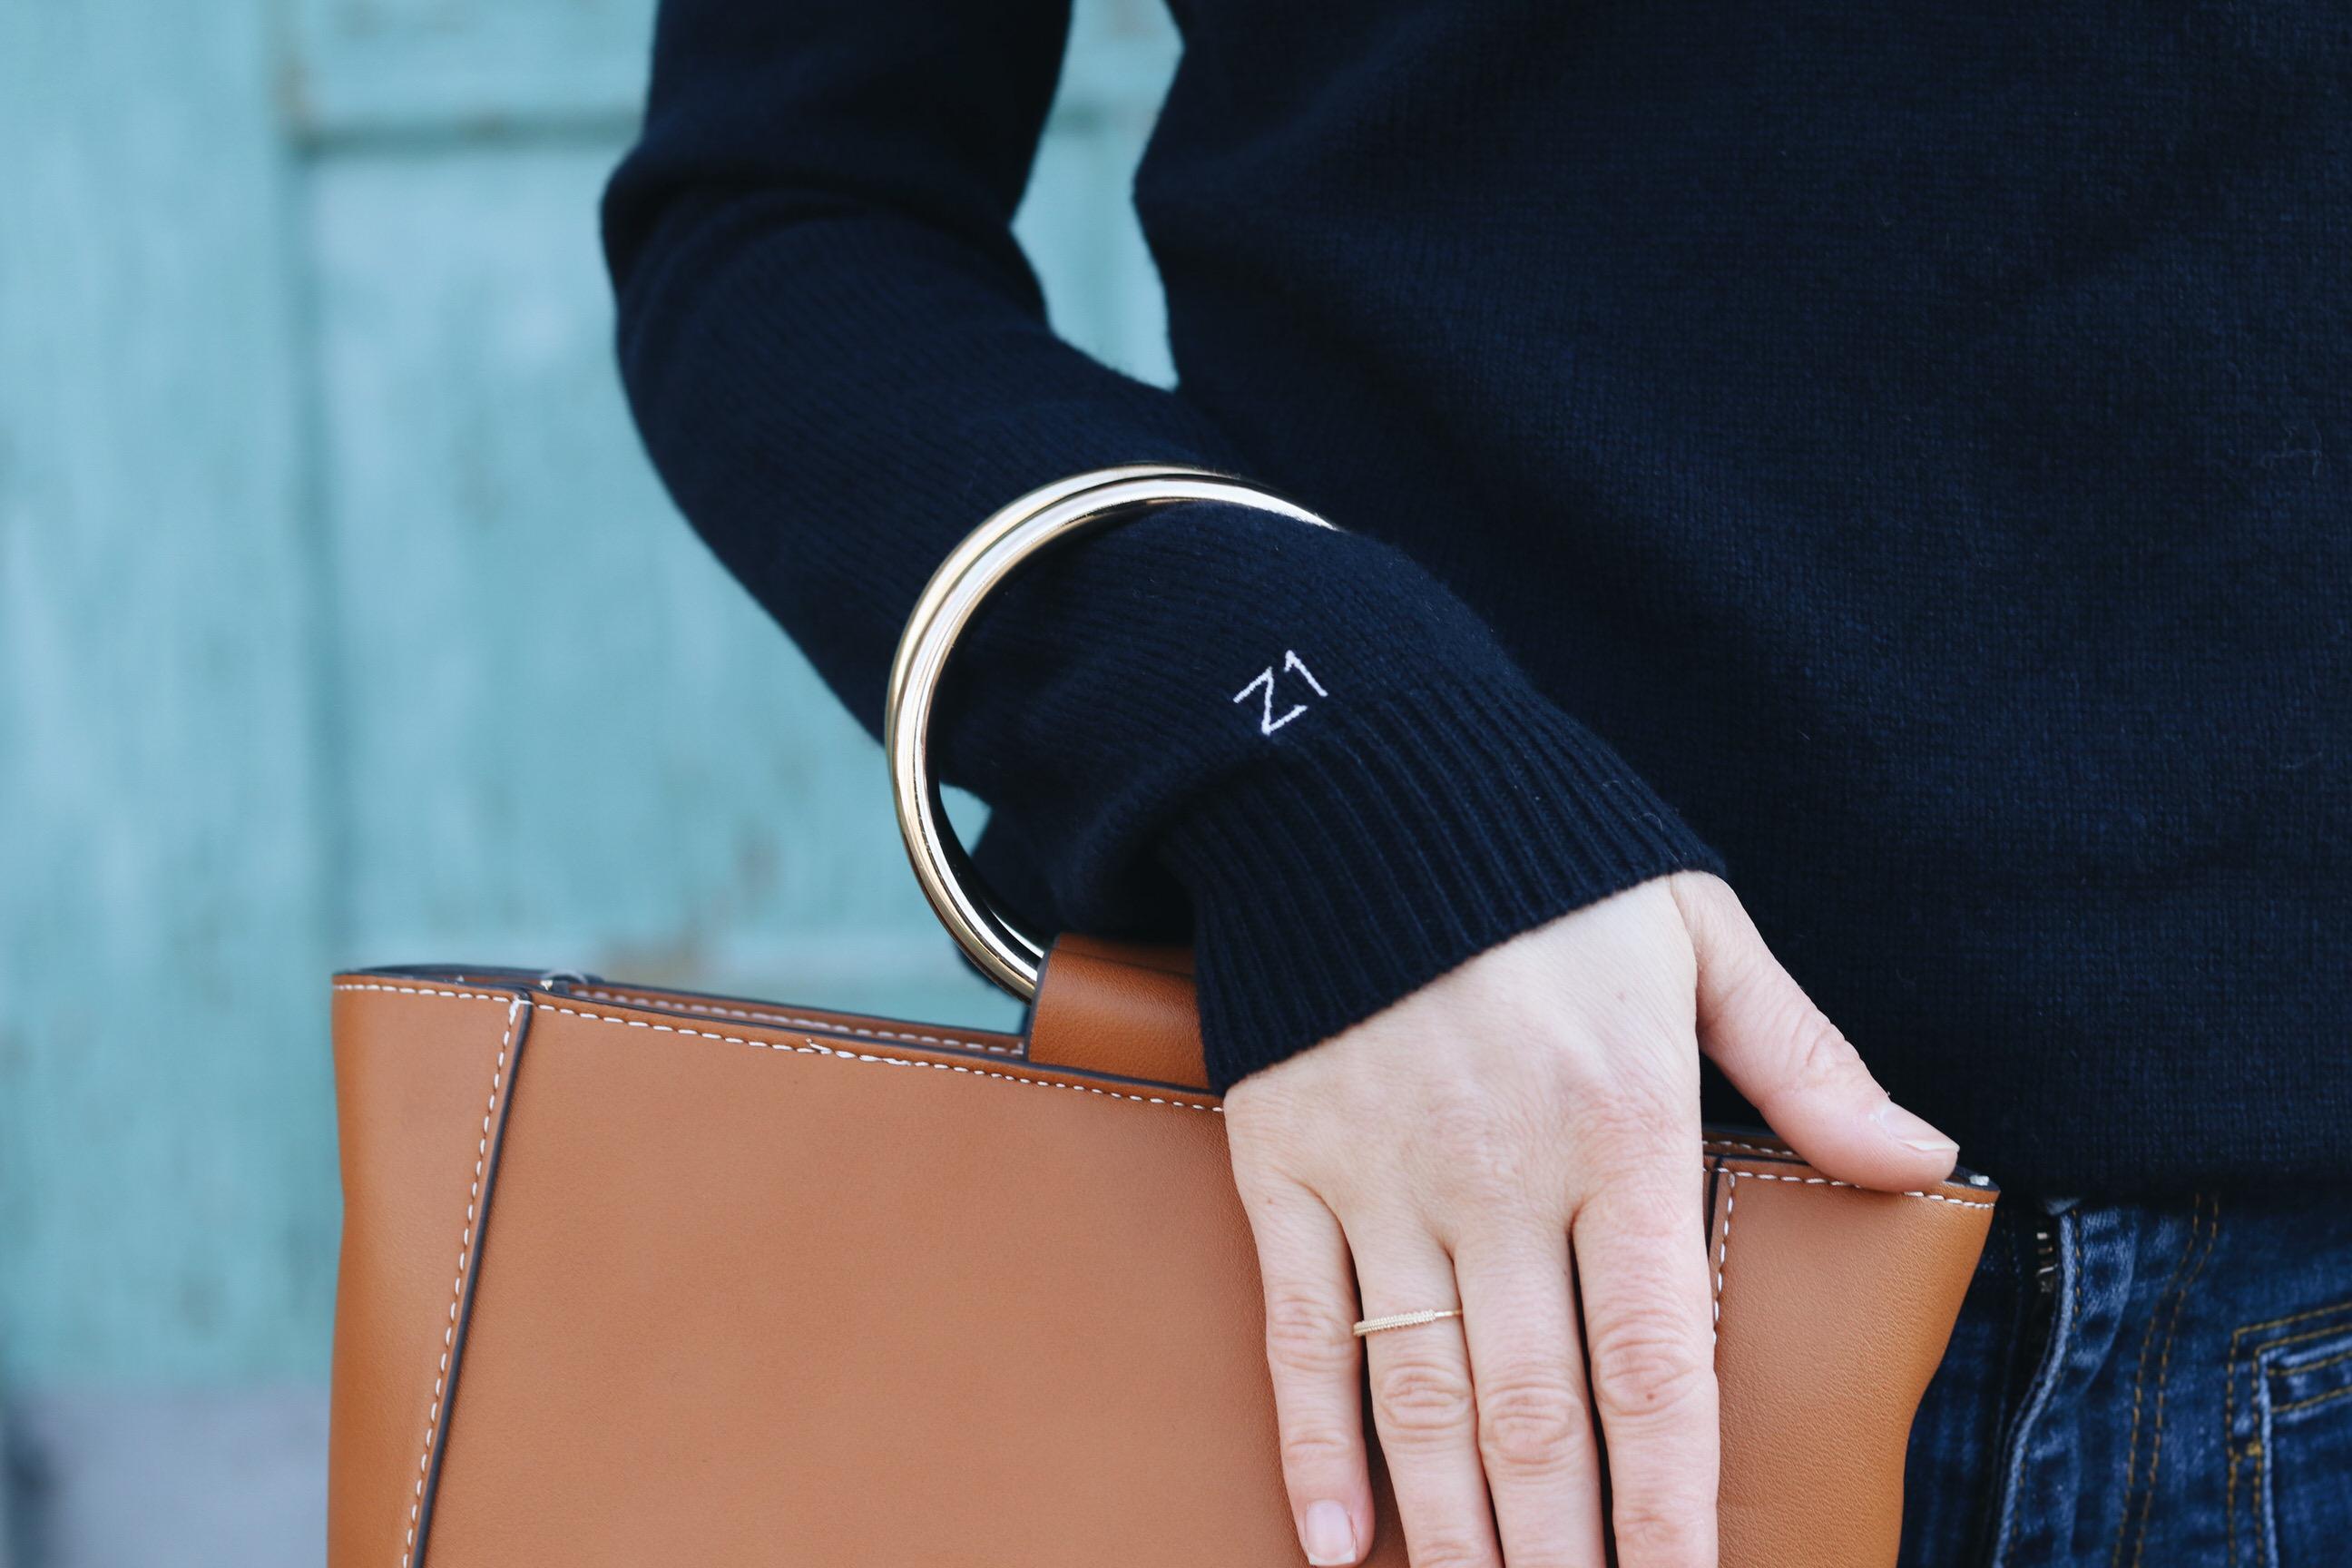 Merinowolle Fairtrade Pullover aus wolle kombinieren Outfit Streetstyle Blog Fashionblogger